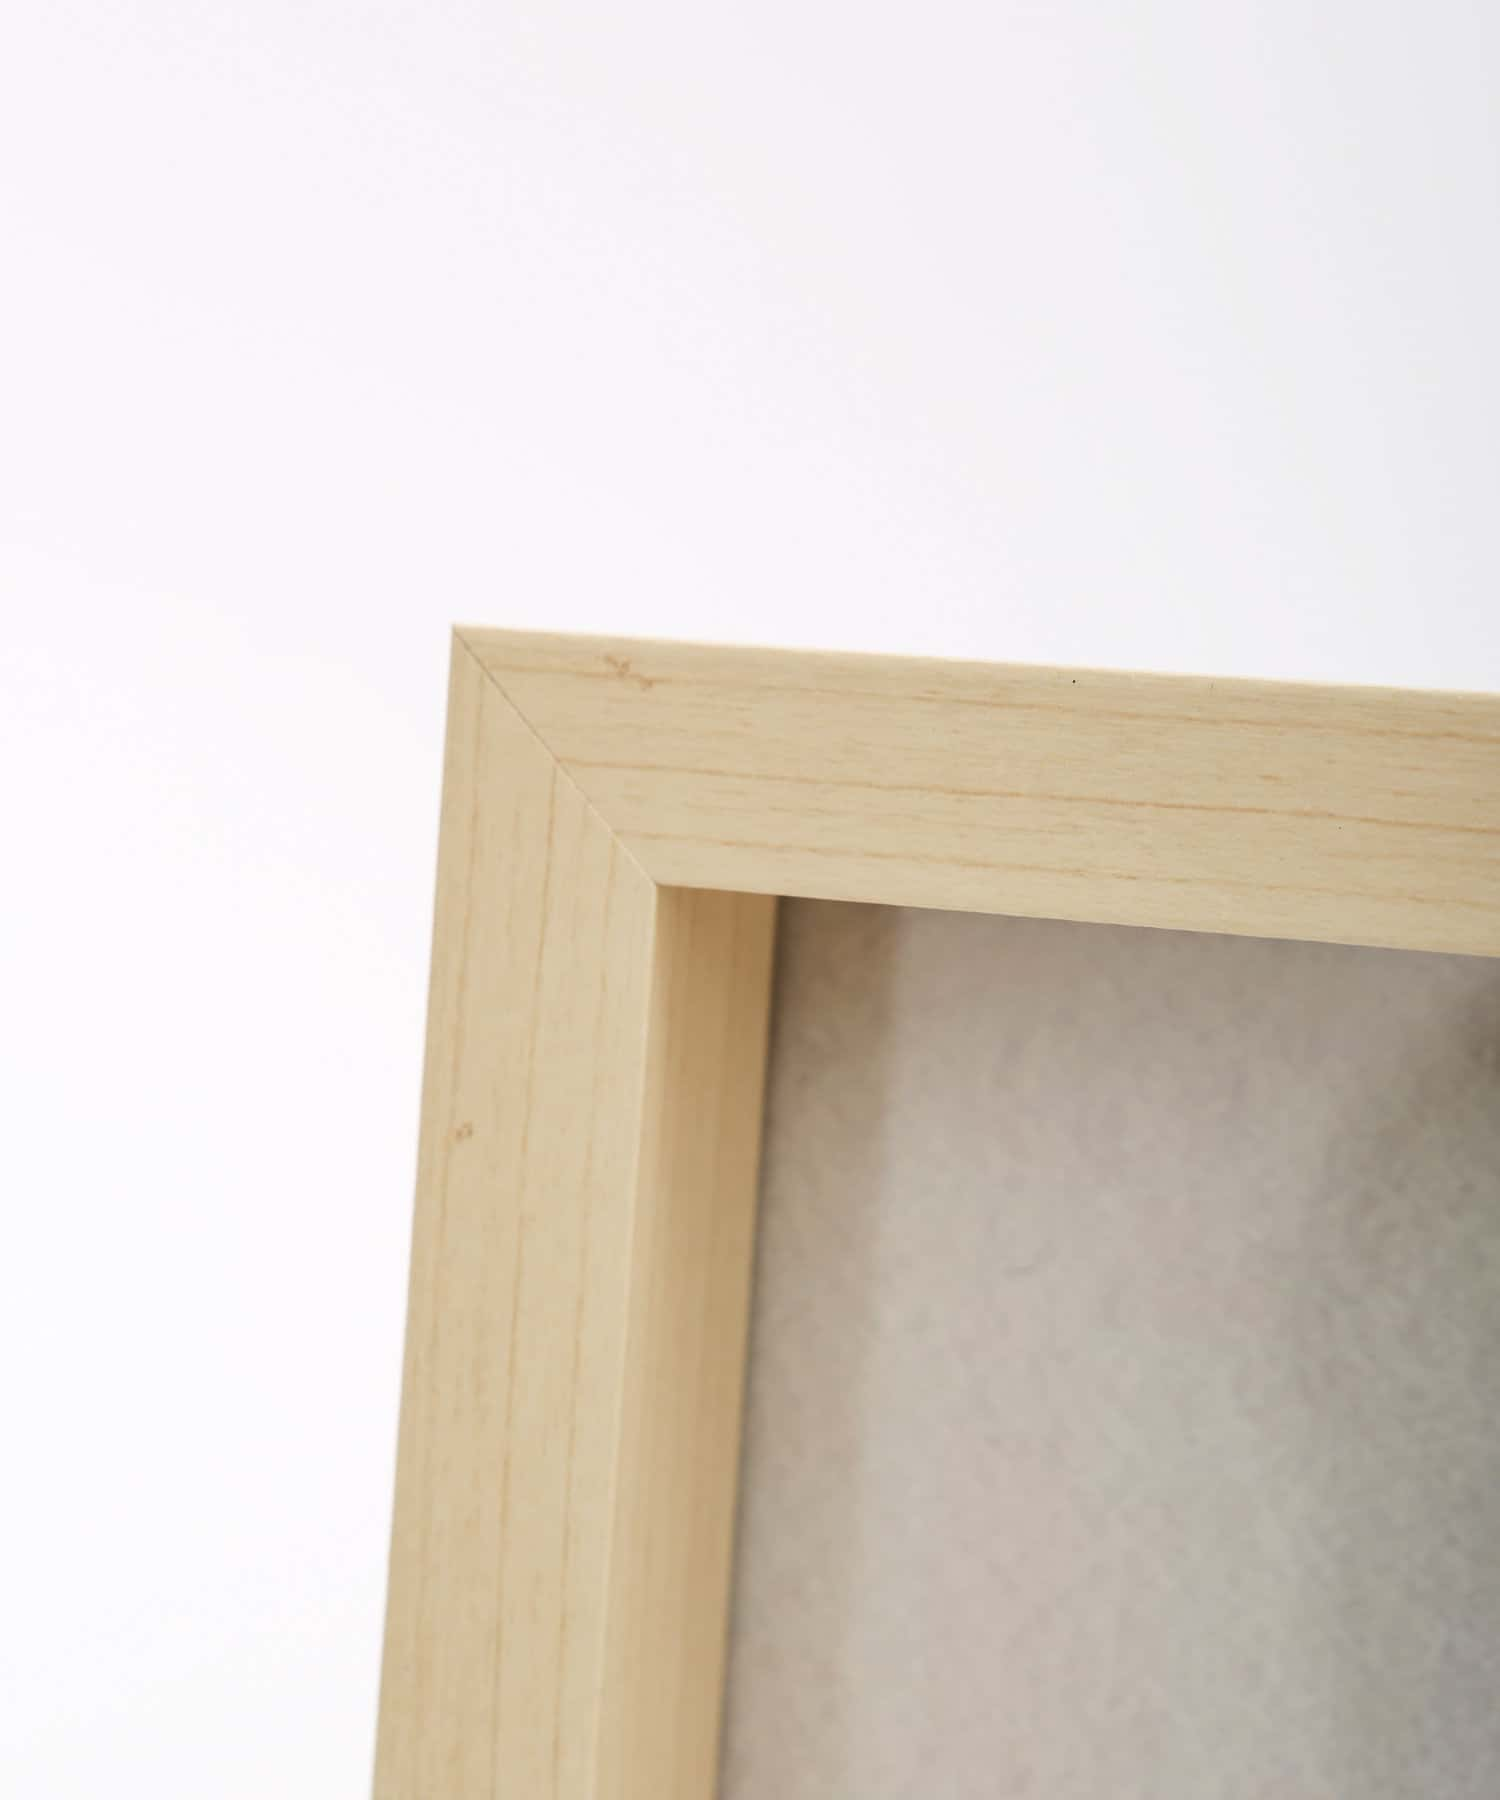 3COINS(スリーコインズ) 【ASOKO】《WEB限定》木製A4サイズフォトフレーム